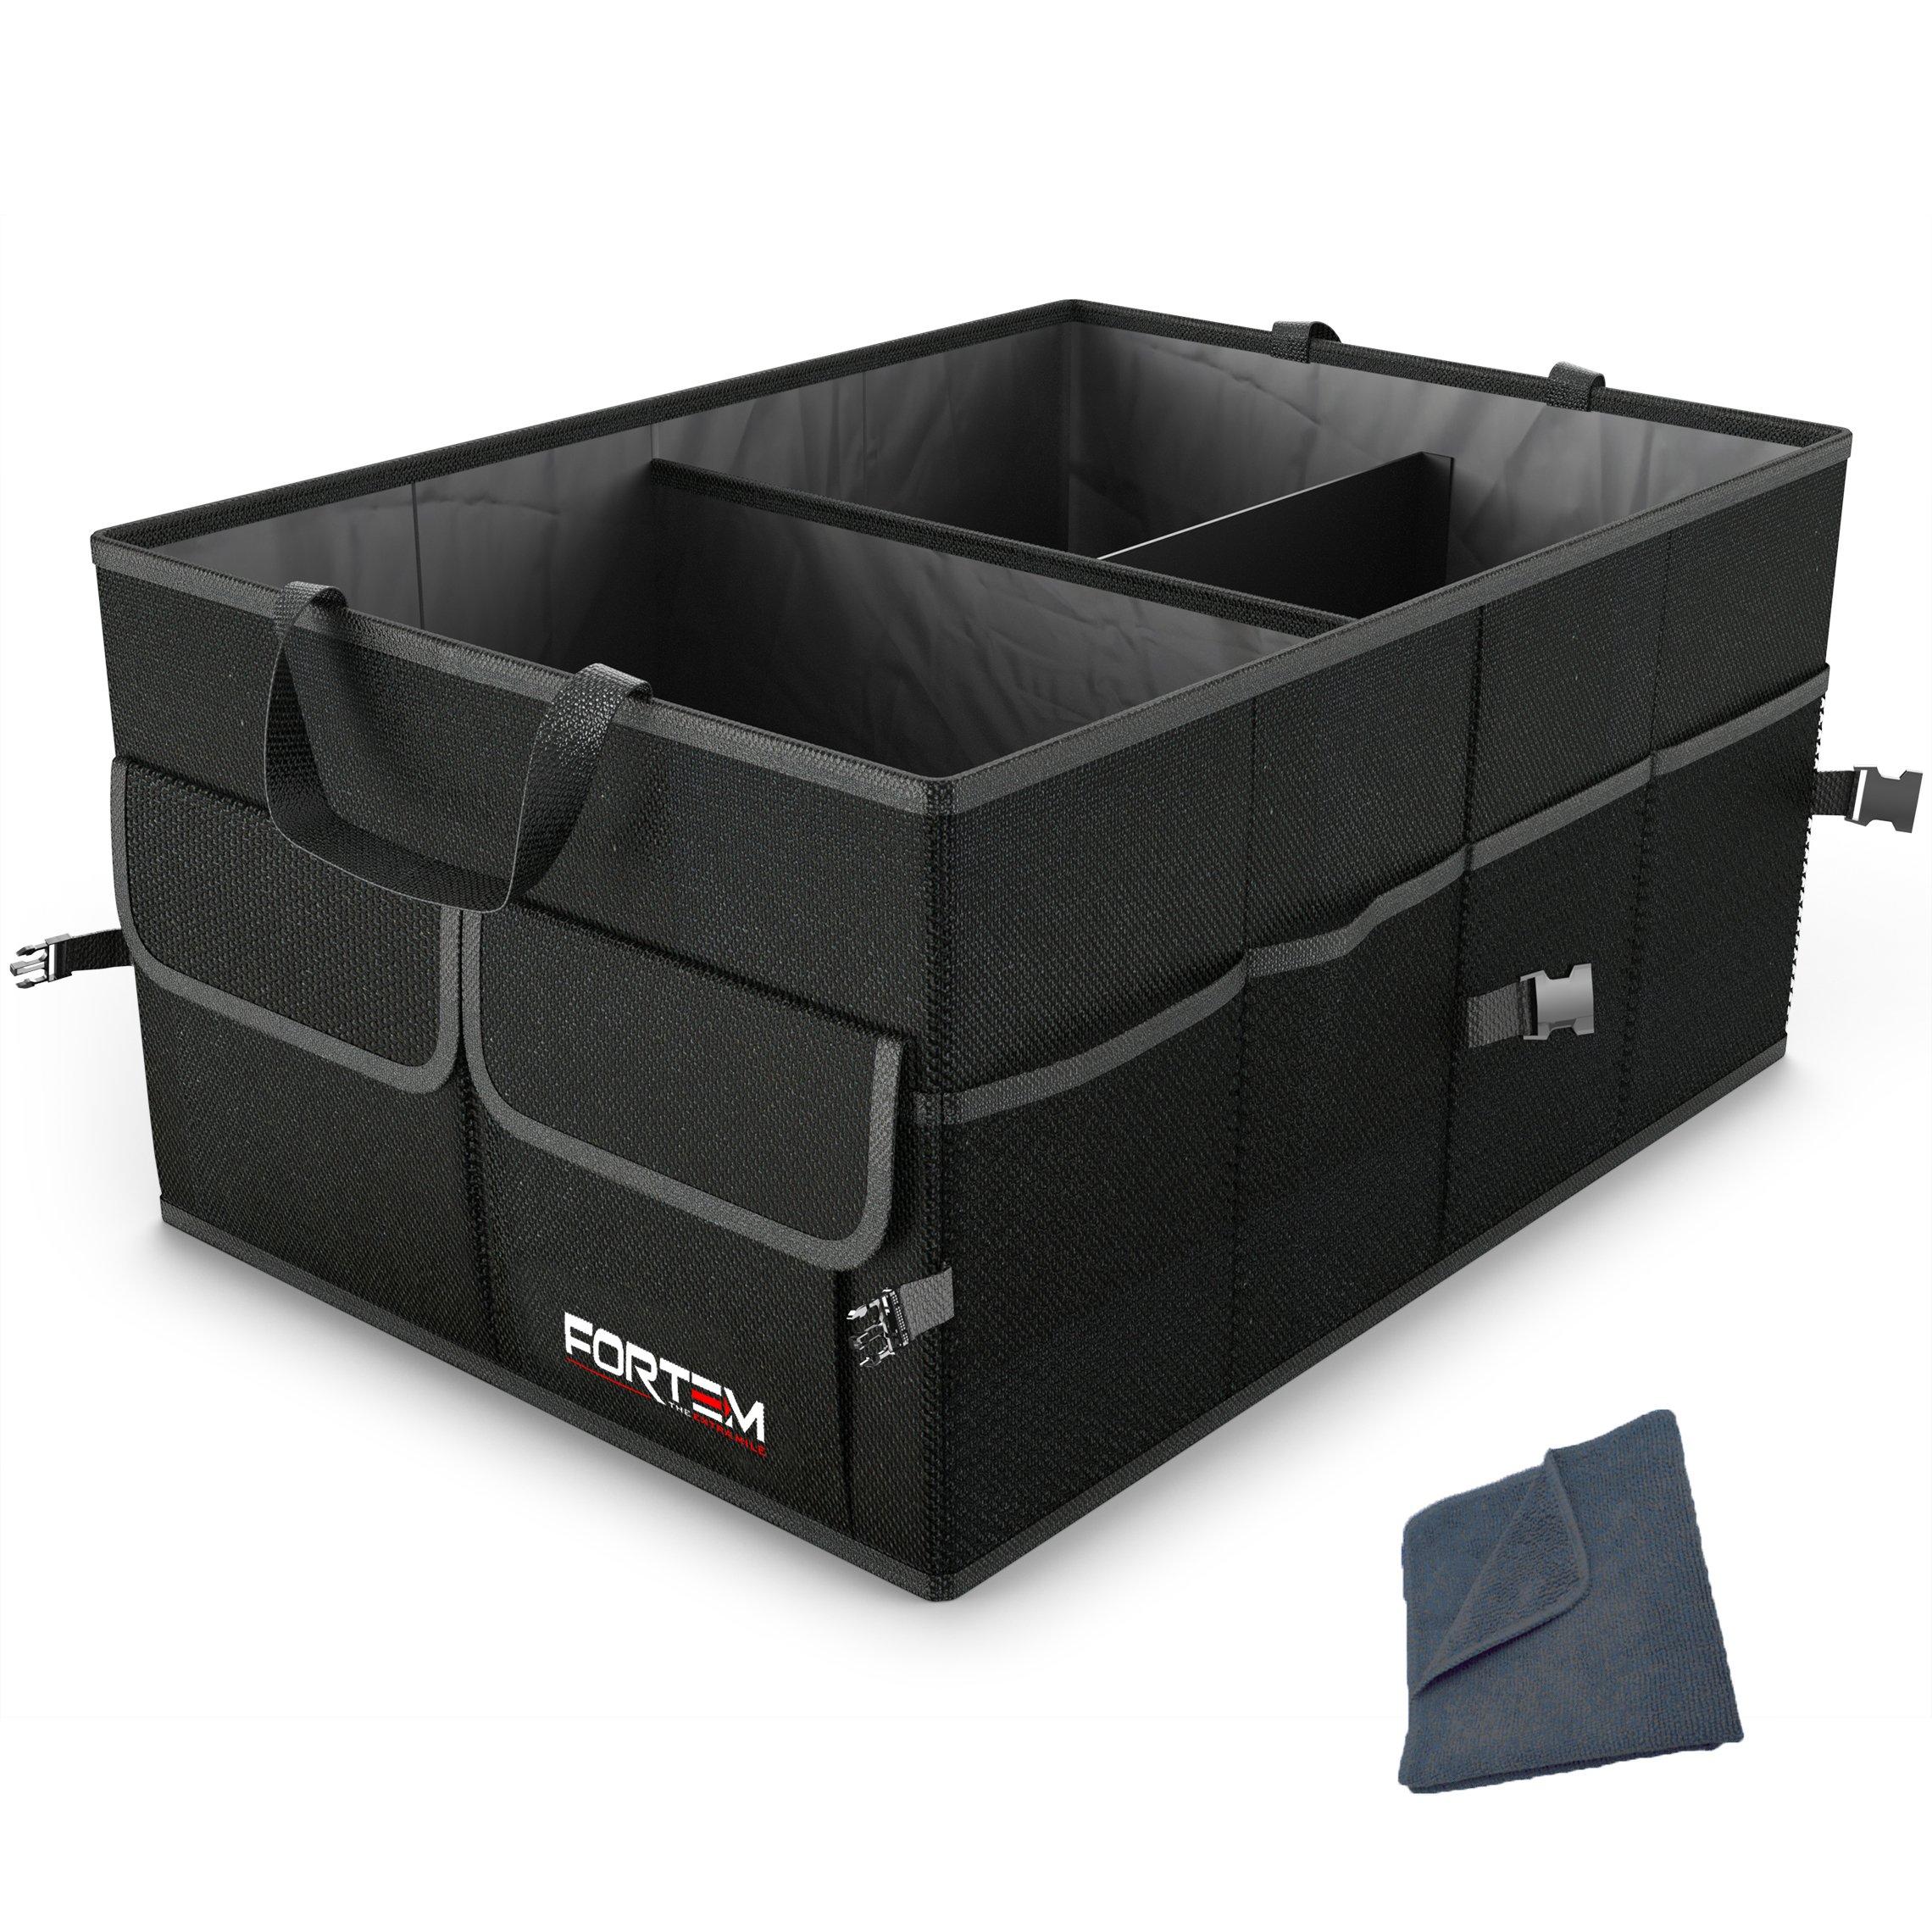 FORTEM - Organizador Para Maletero Plegable Con Separadores y Tiras De Velcro Antideslizantes Incluye Cobertor Impermeable